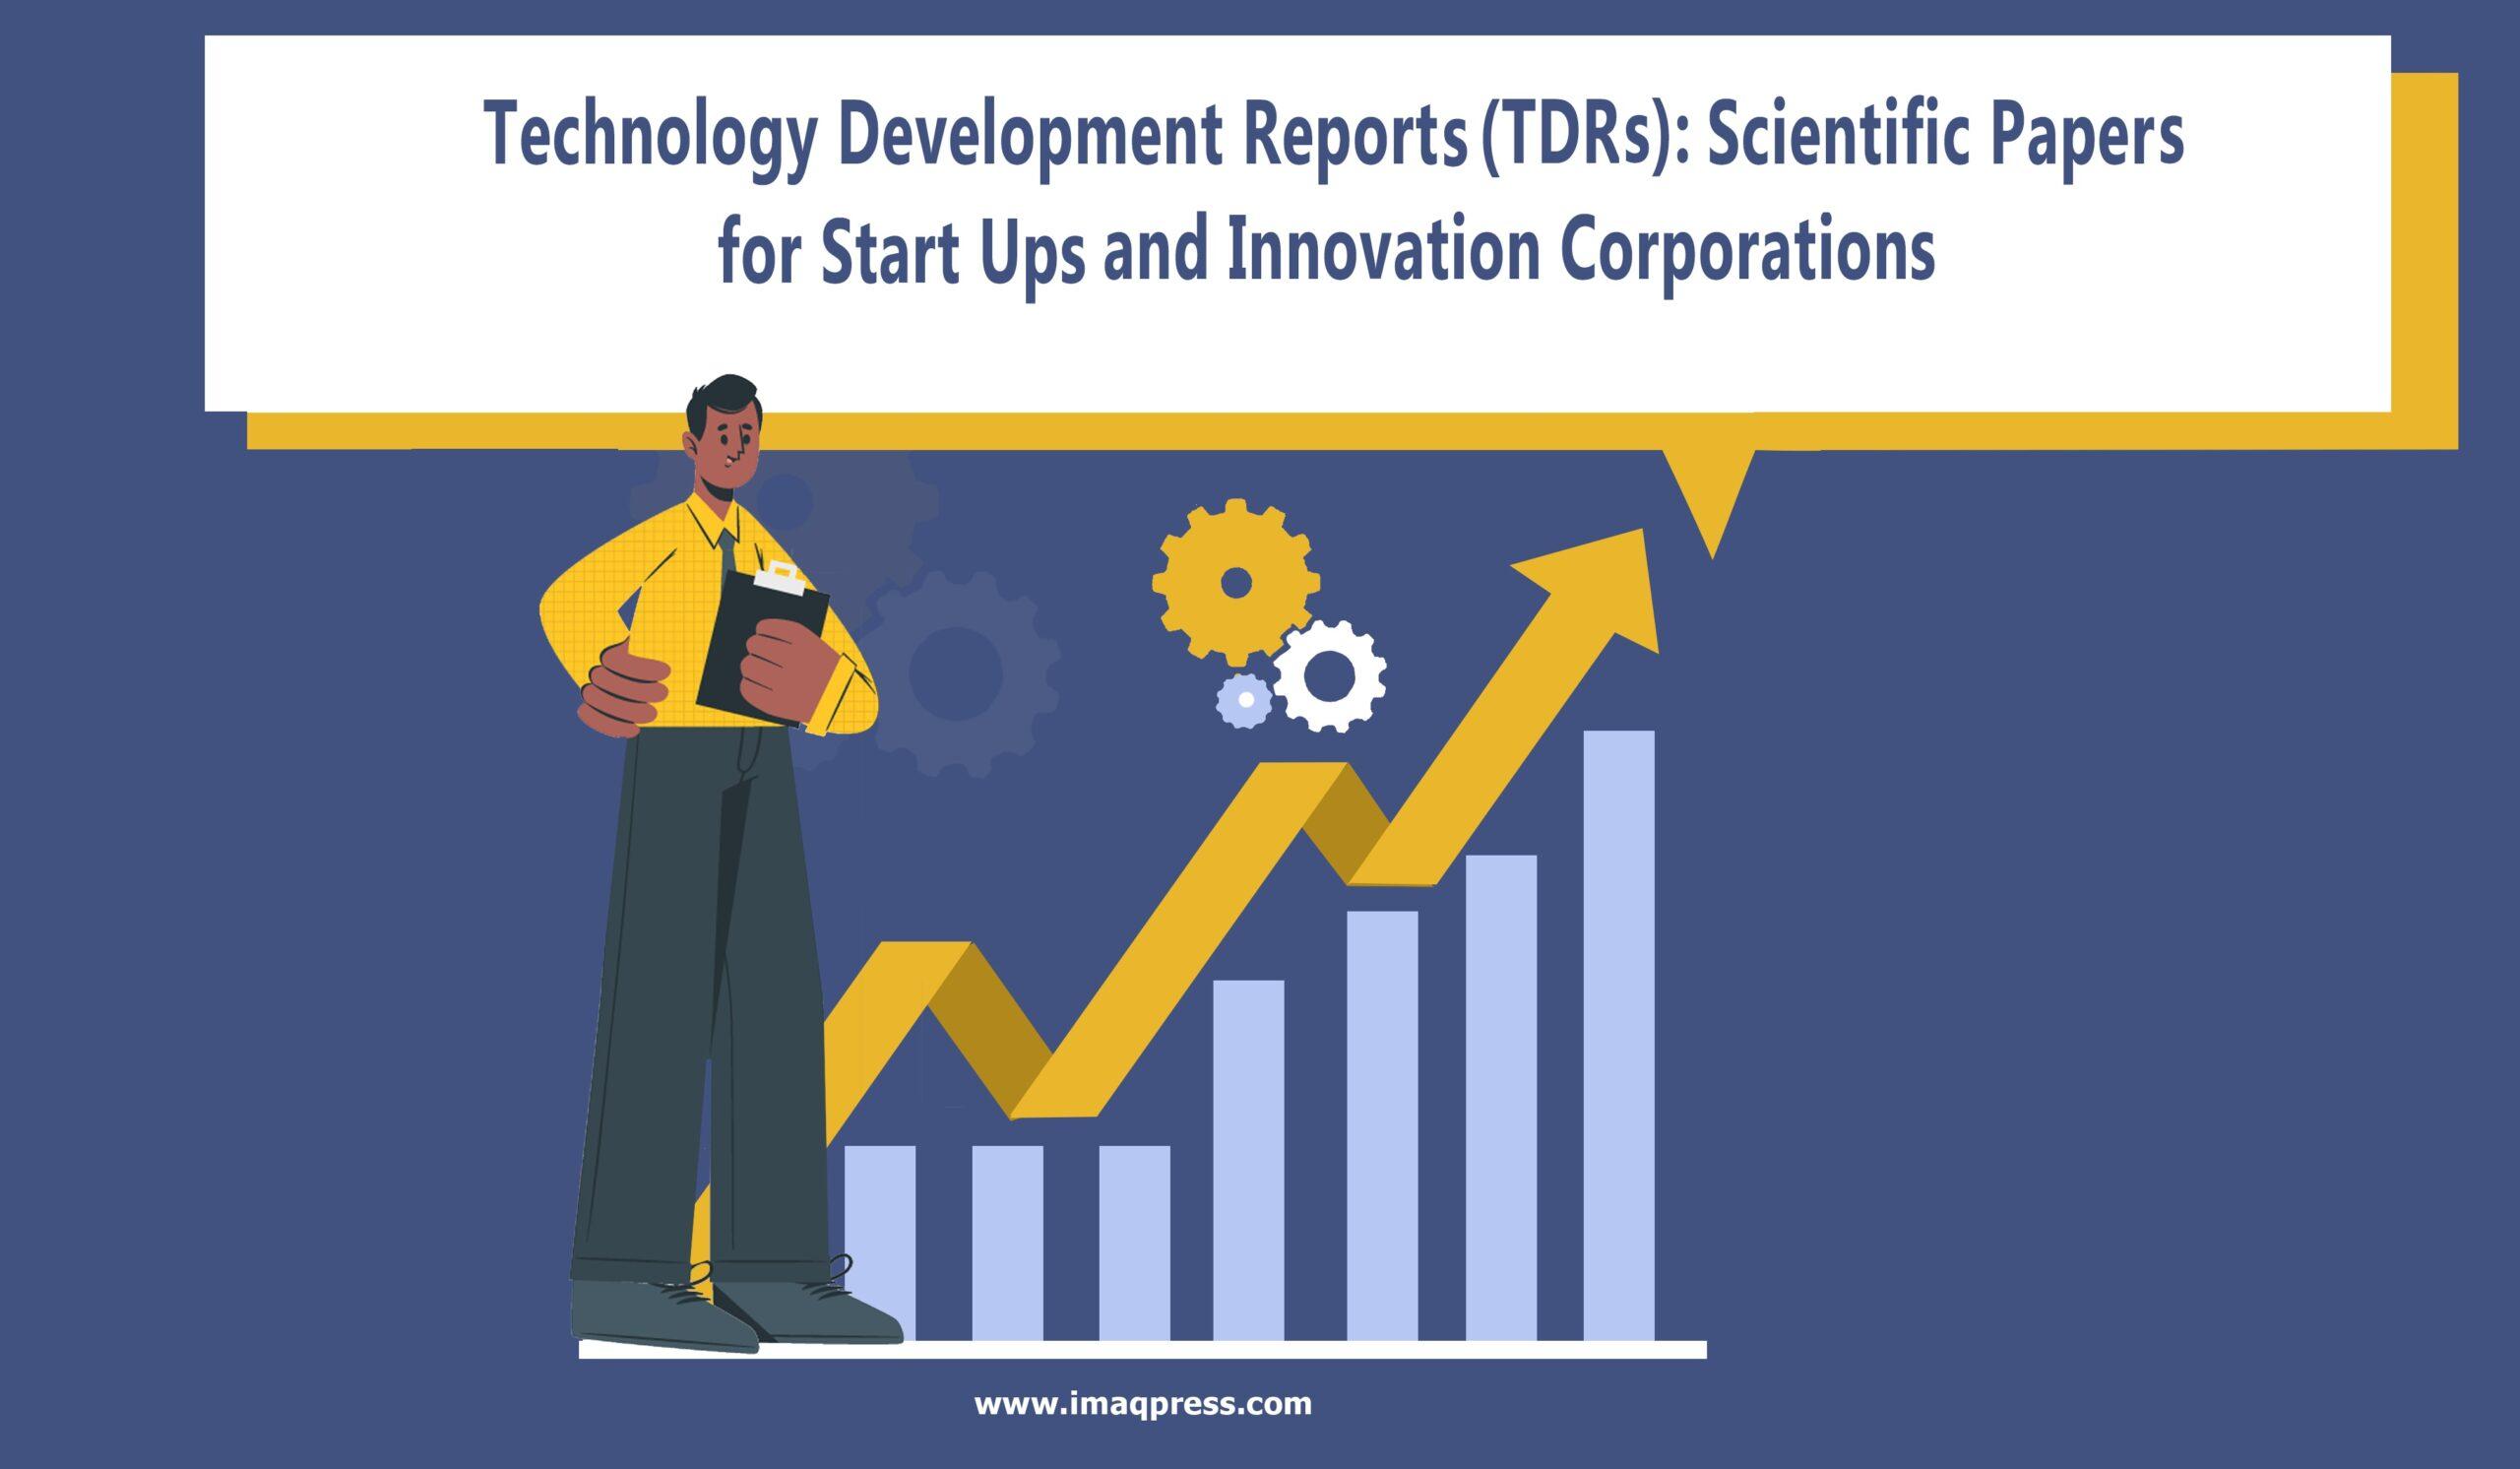 Technology Development Reports (TDRs)